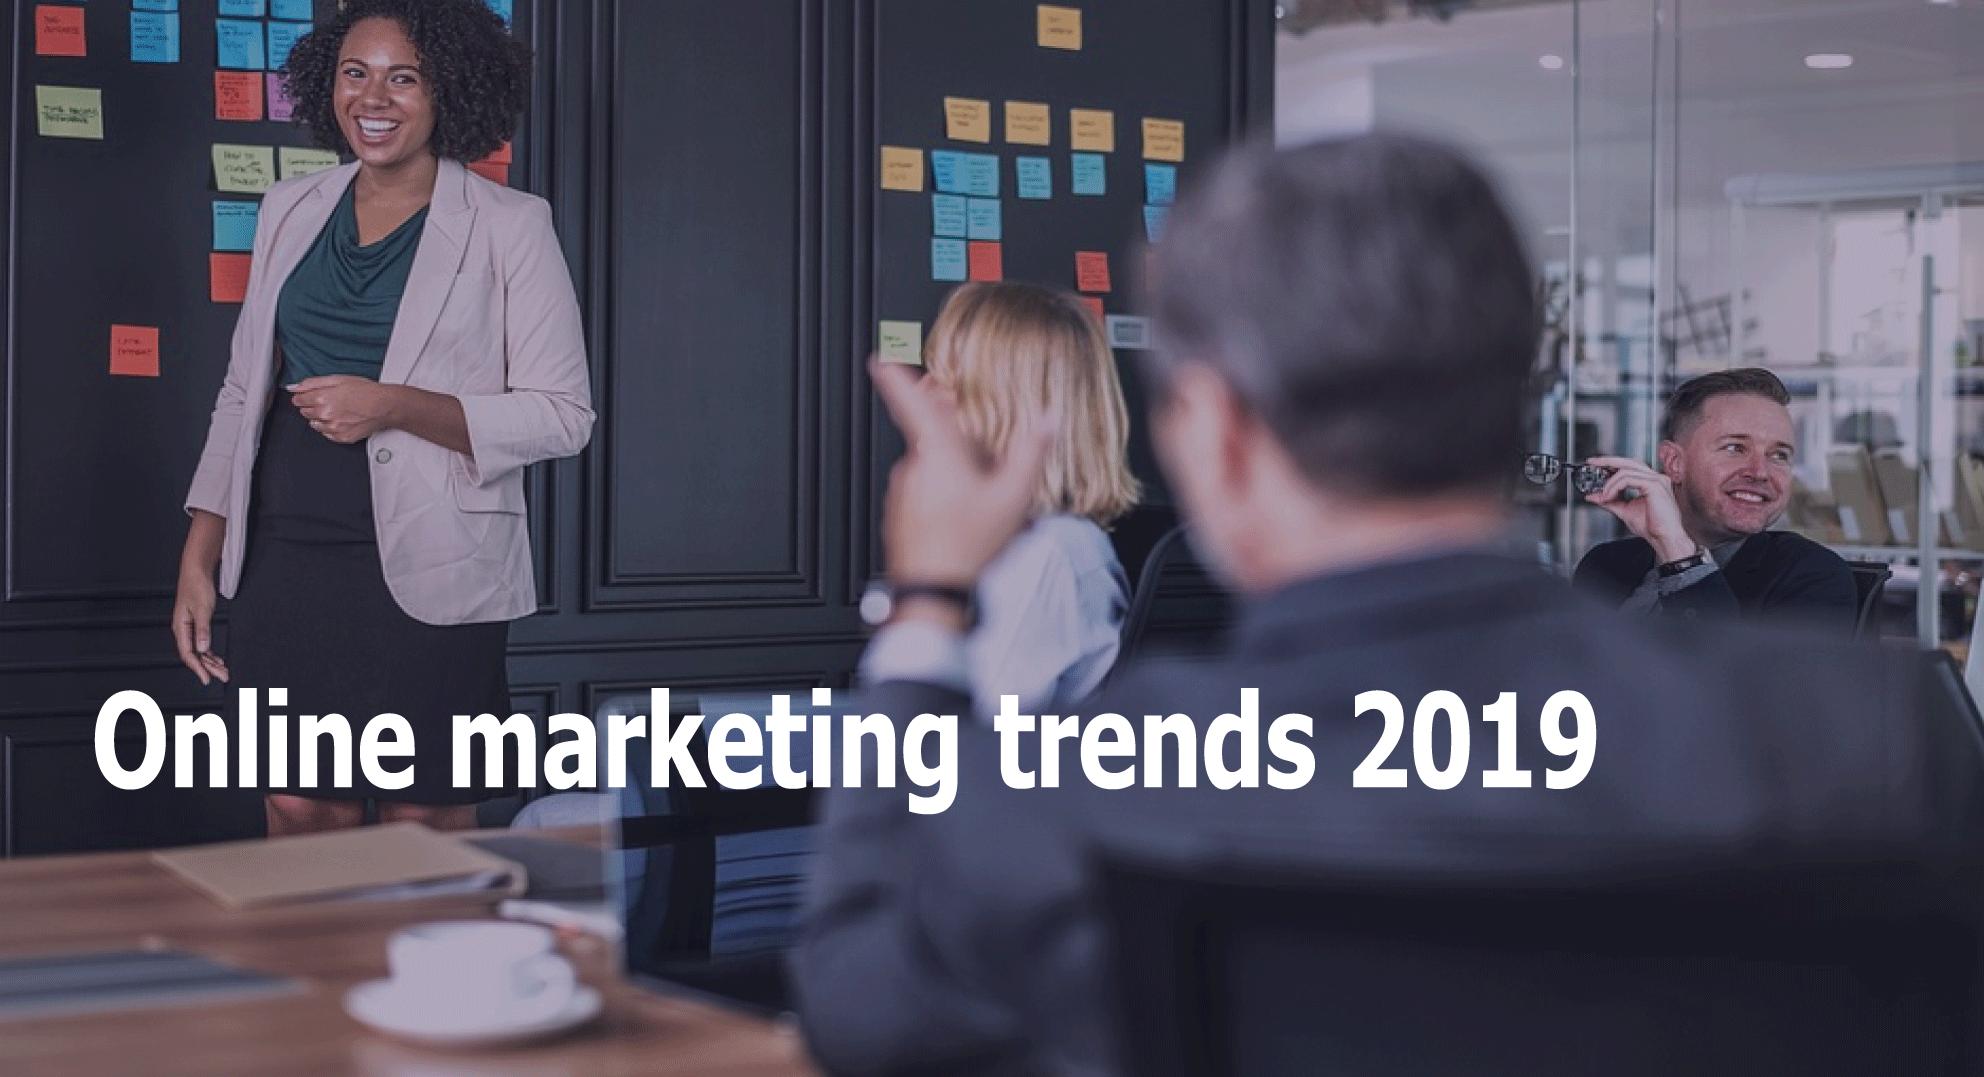 Online marketing trends 2019